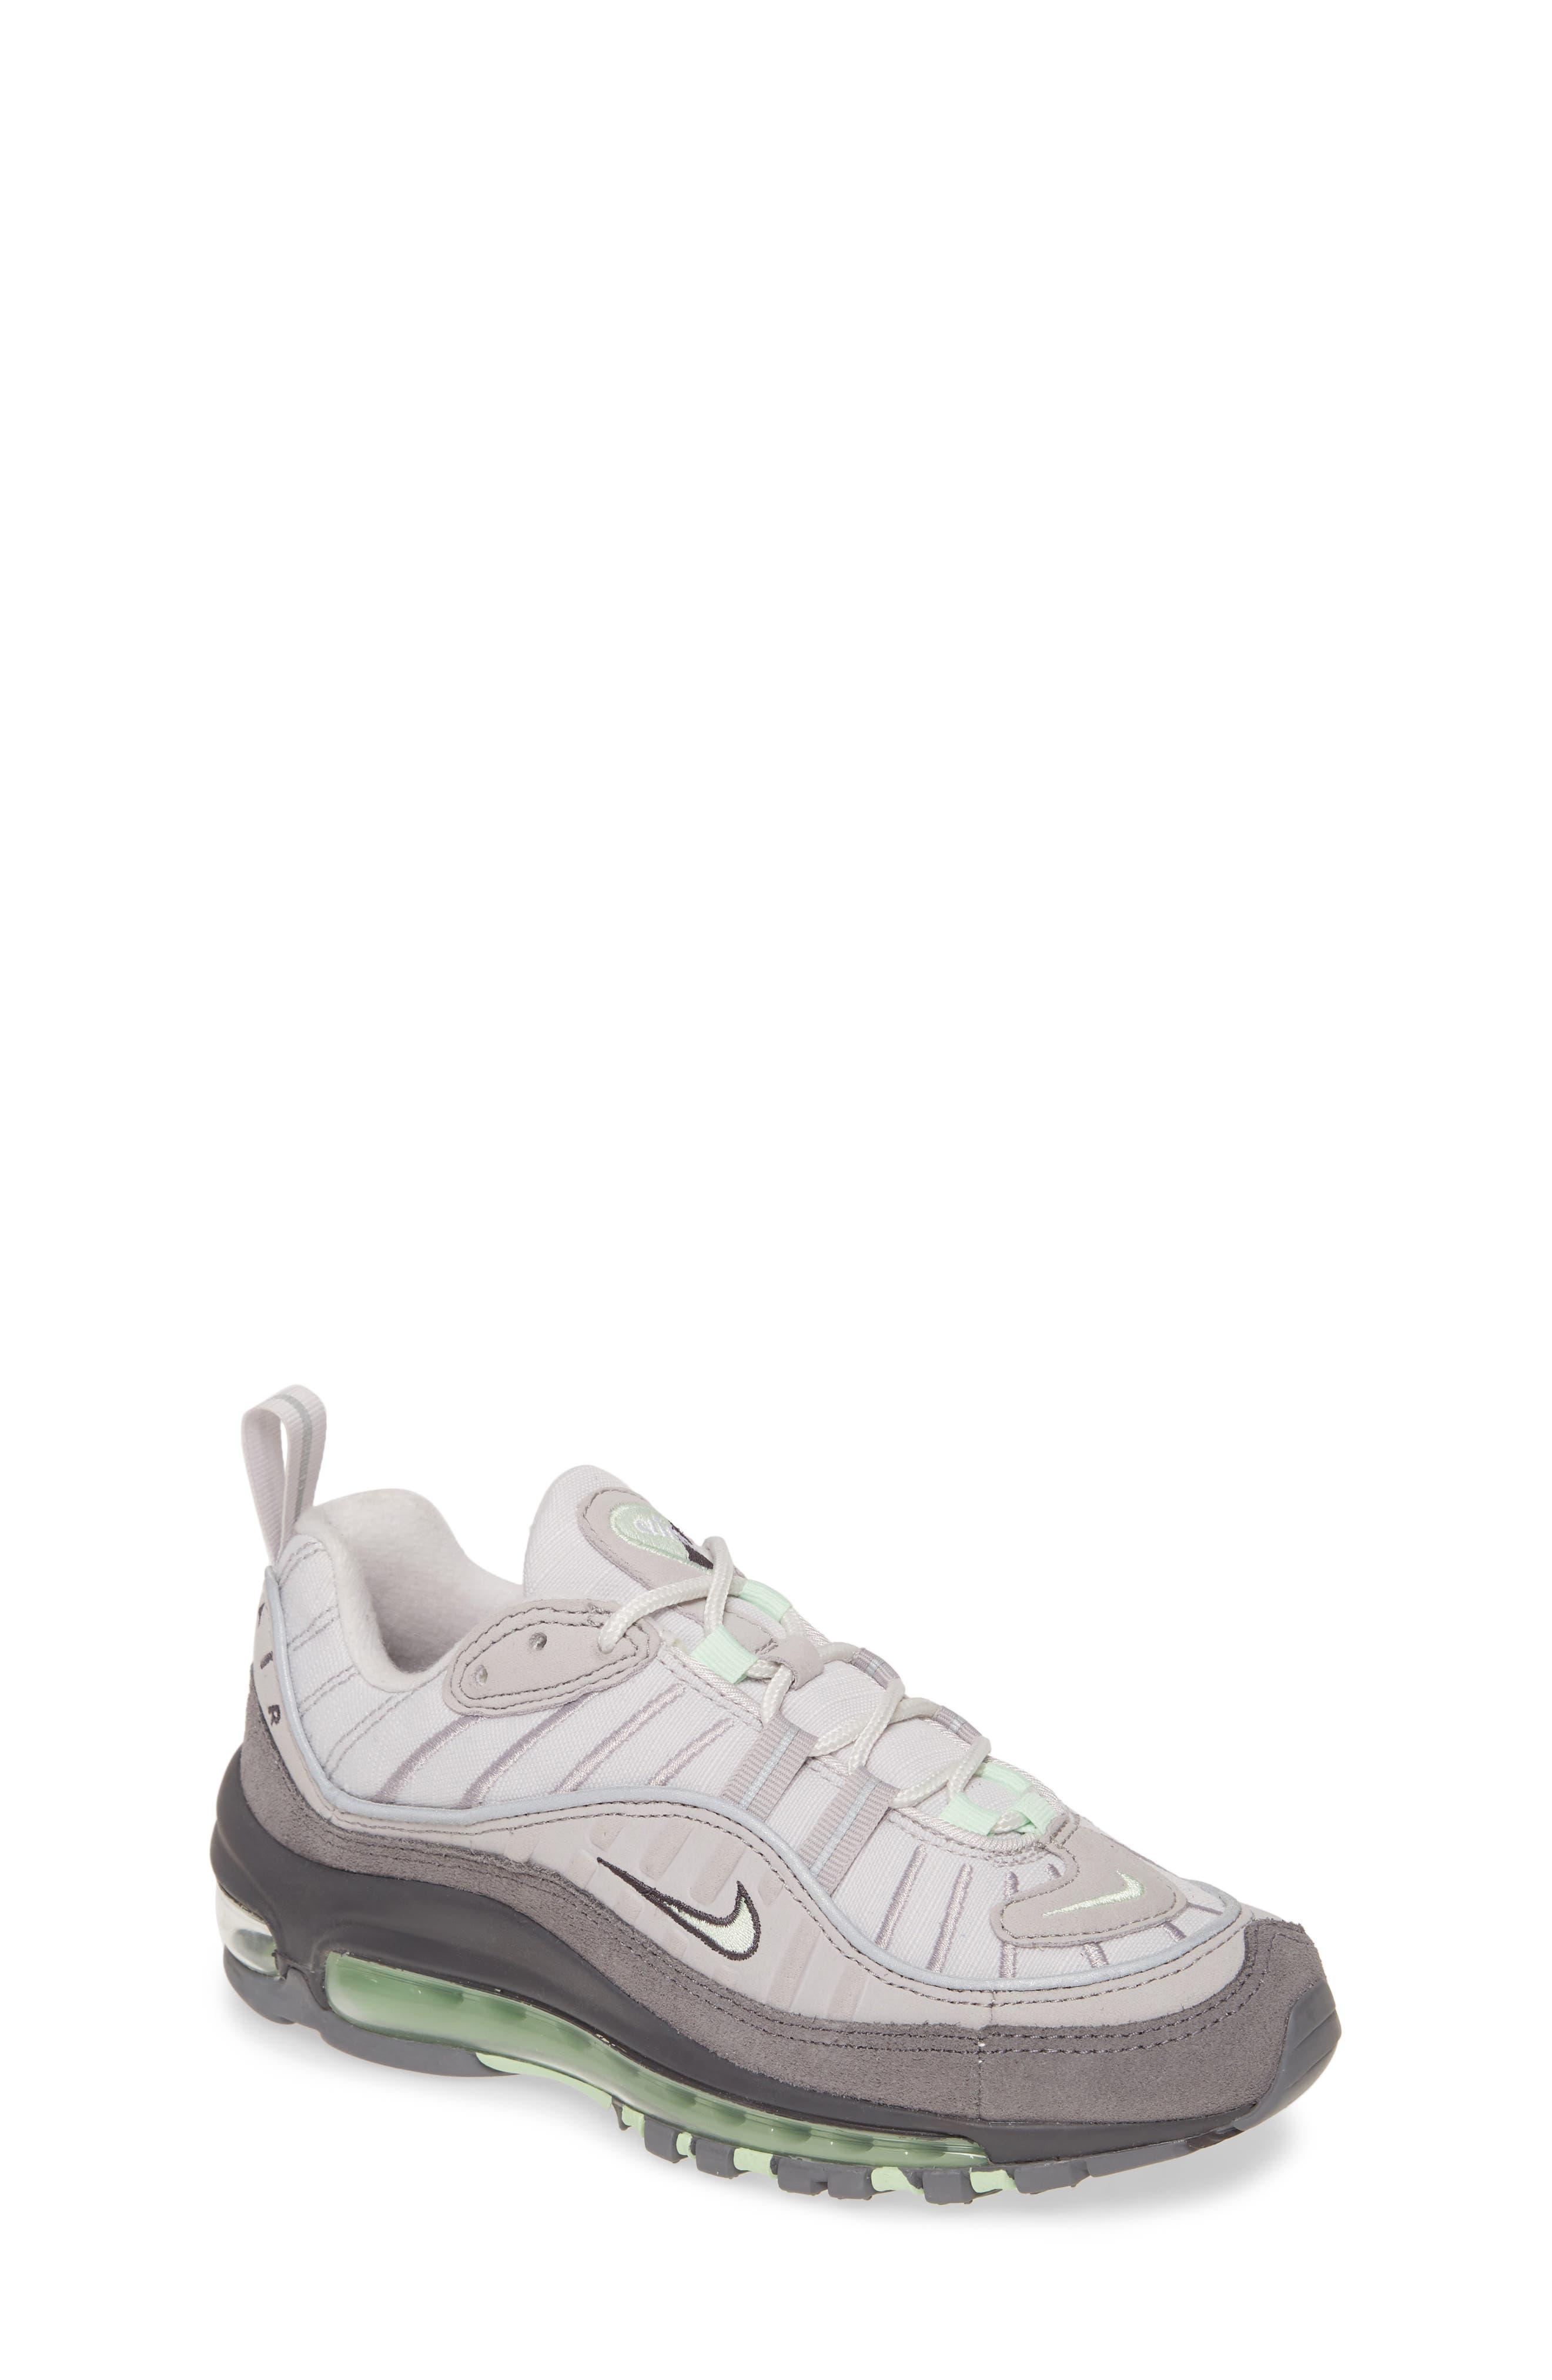 Kids Nike Air Max 98 Bg Sneaker Size 6 M  Grey